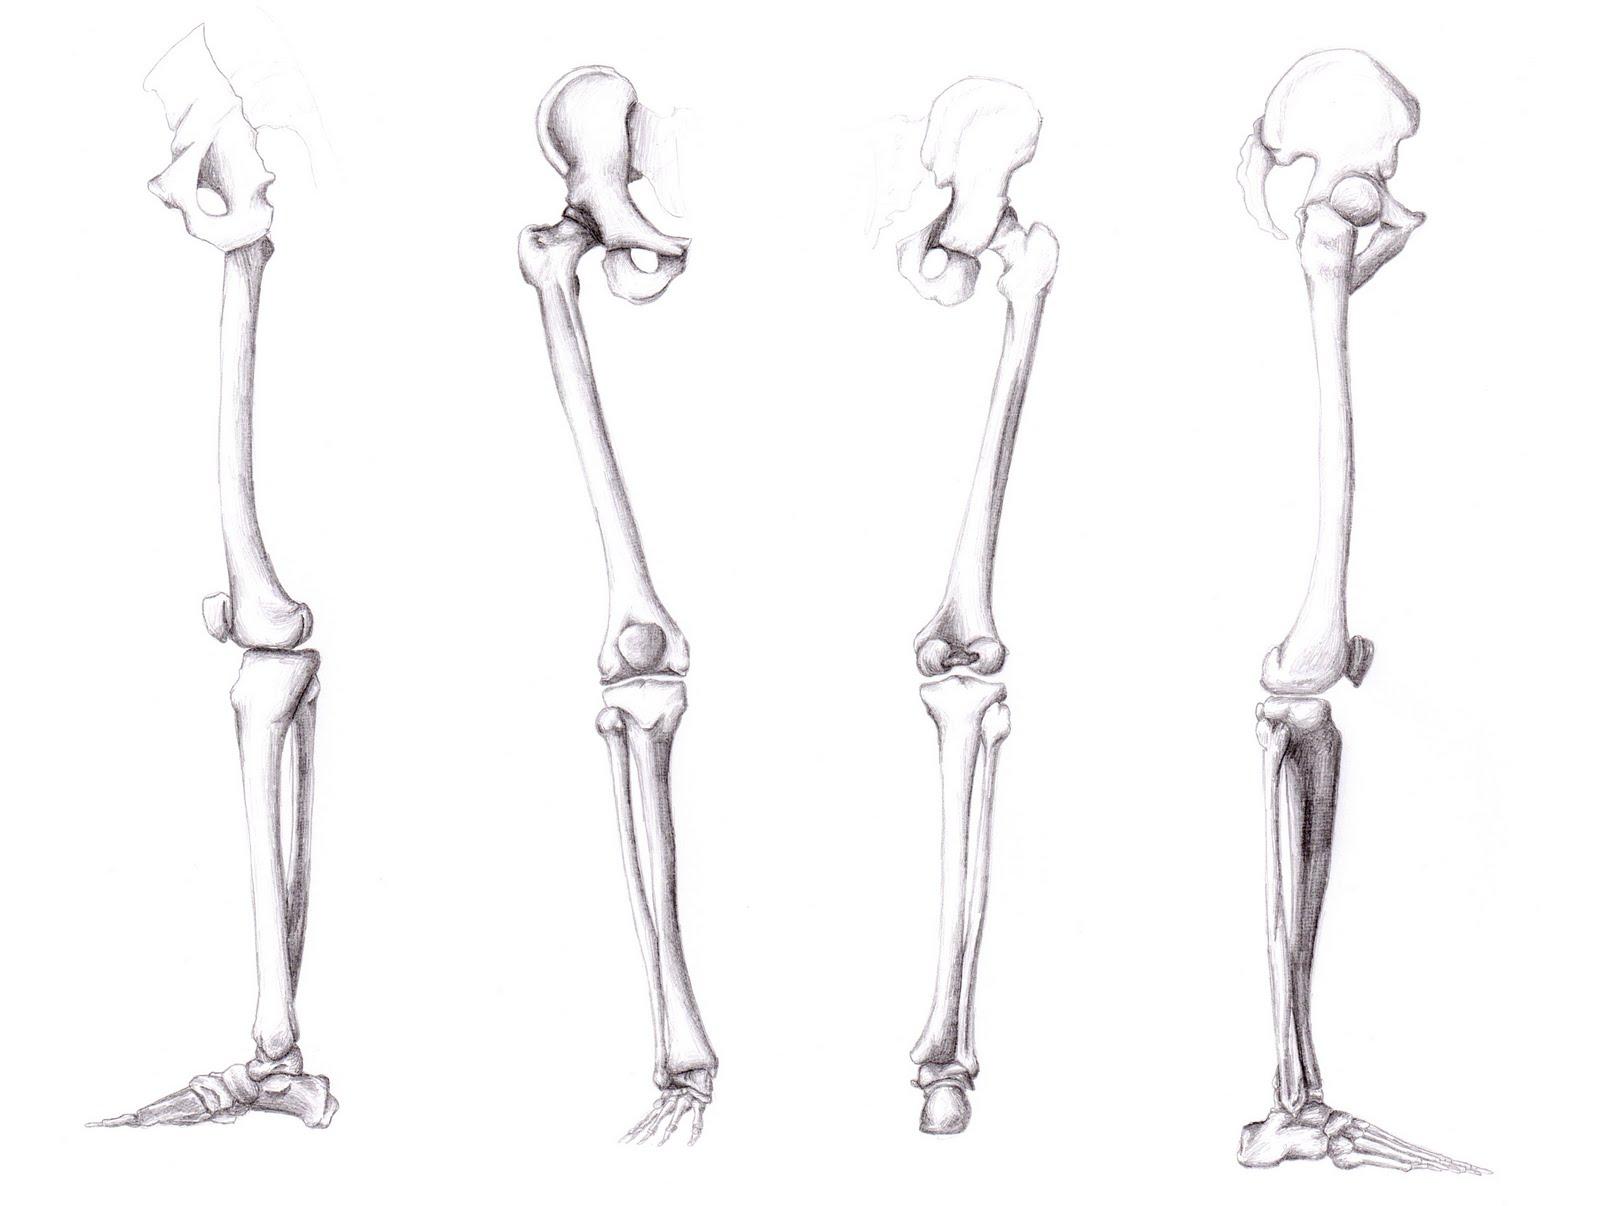 Teliga Osteologia Do Torax E Dos Membros